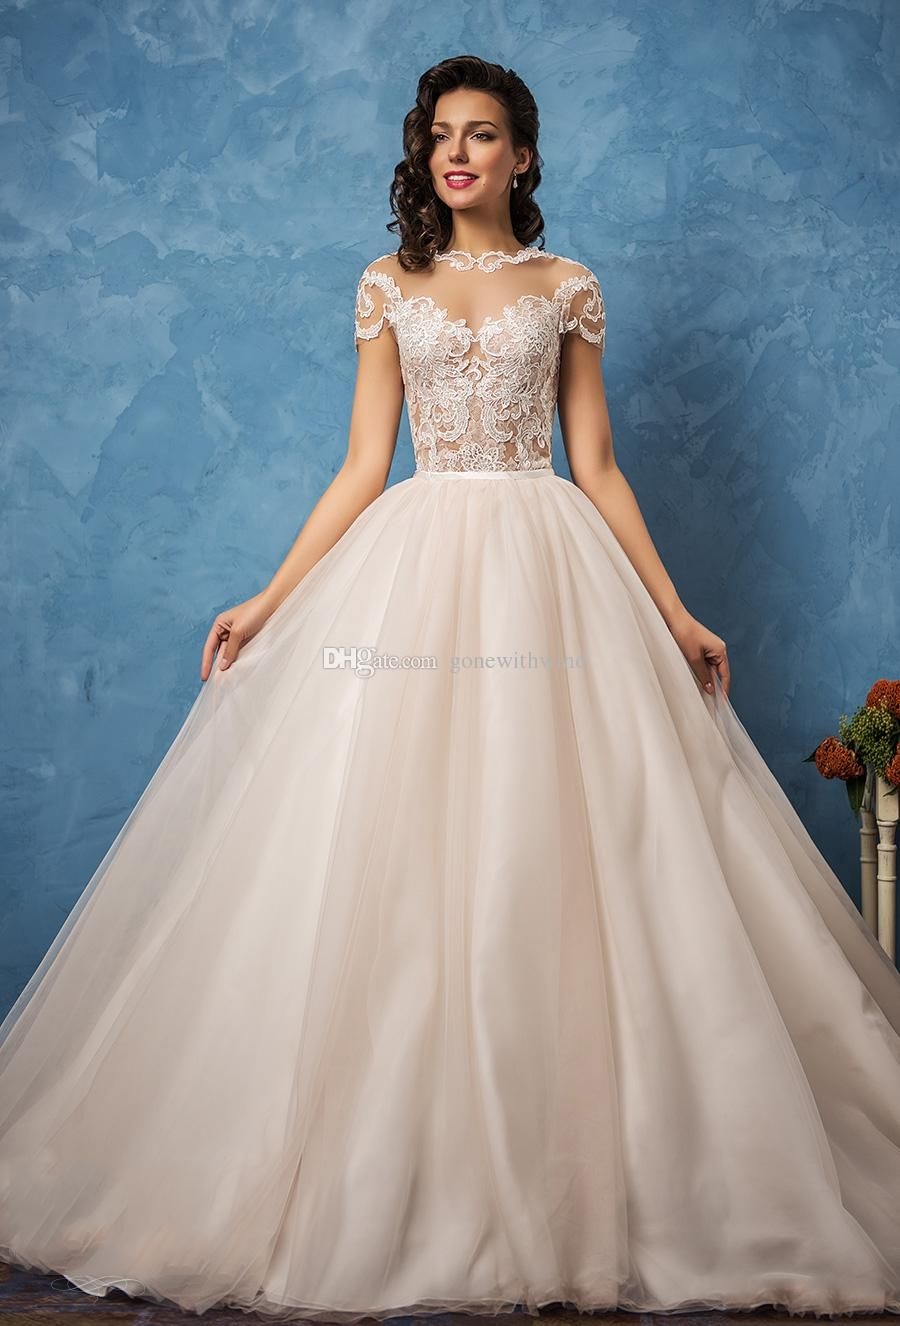 Sheer Sweetheart Dress